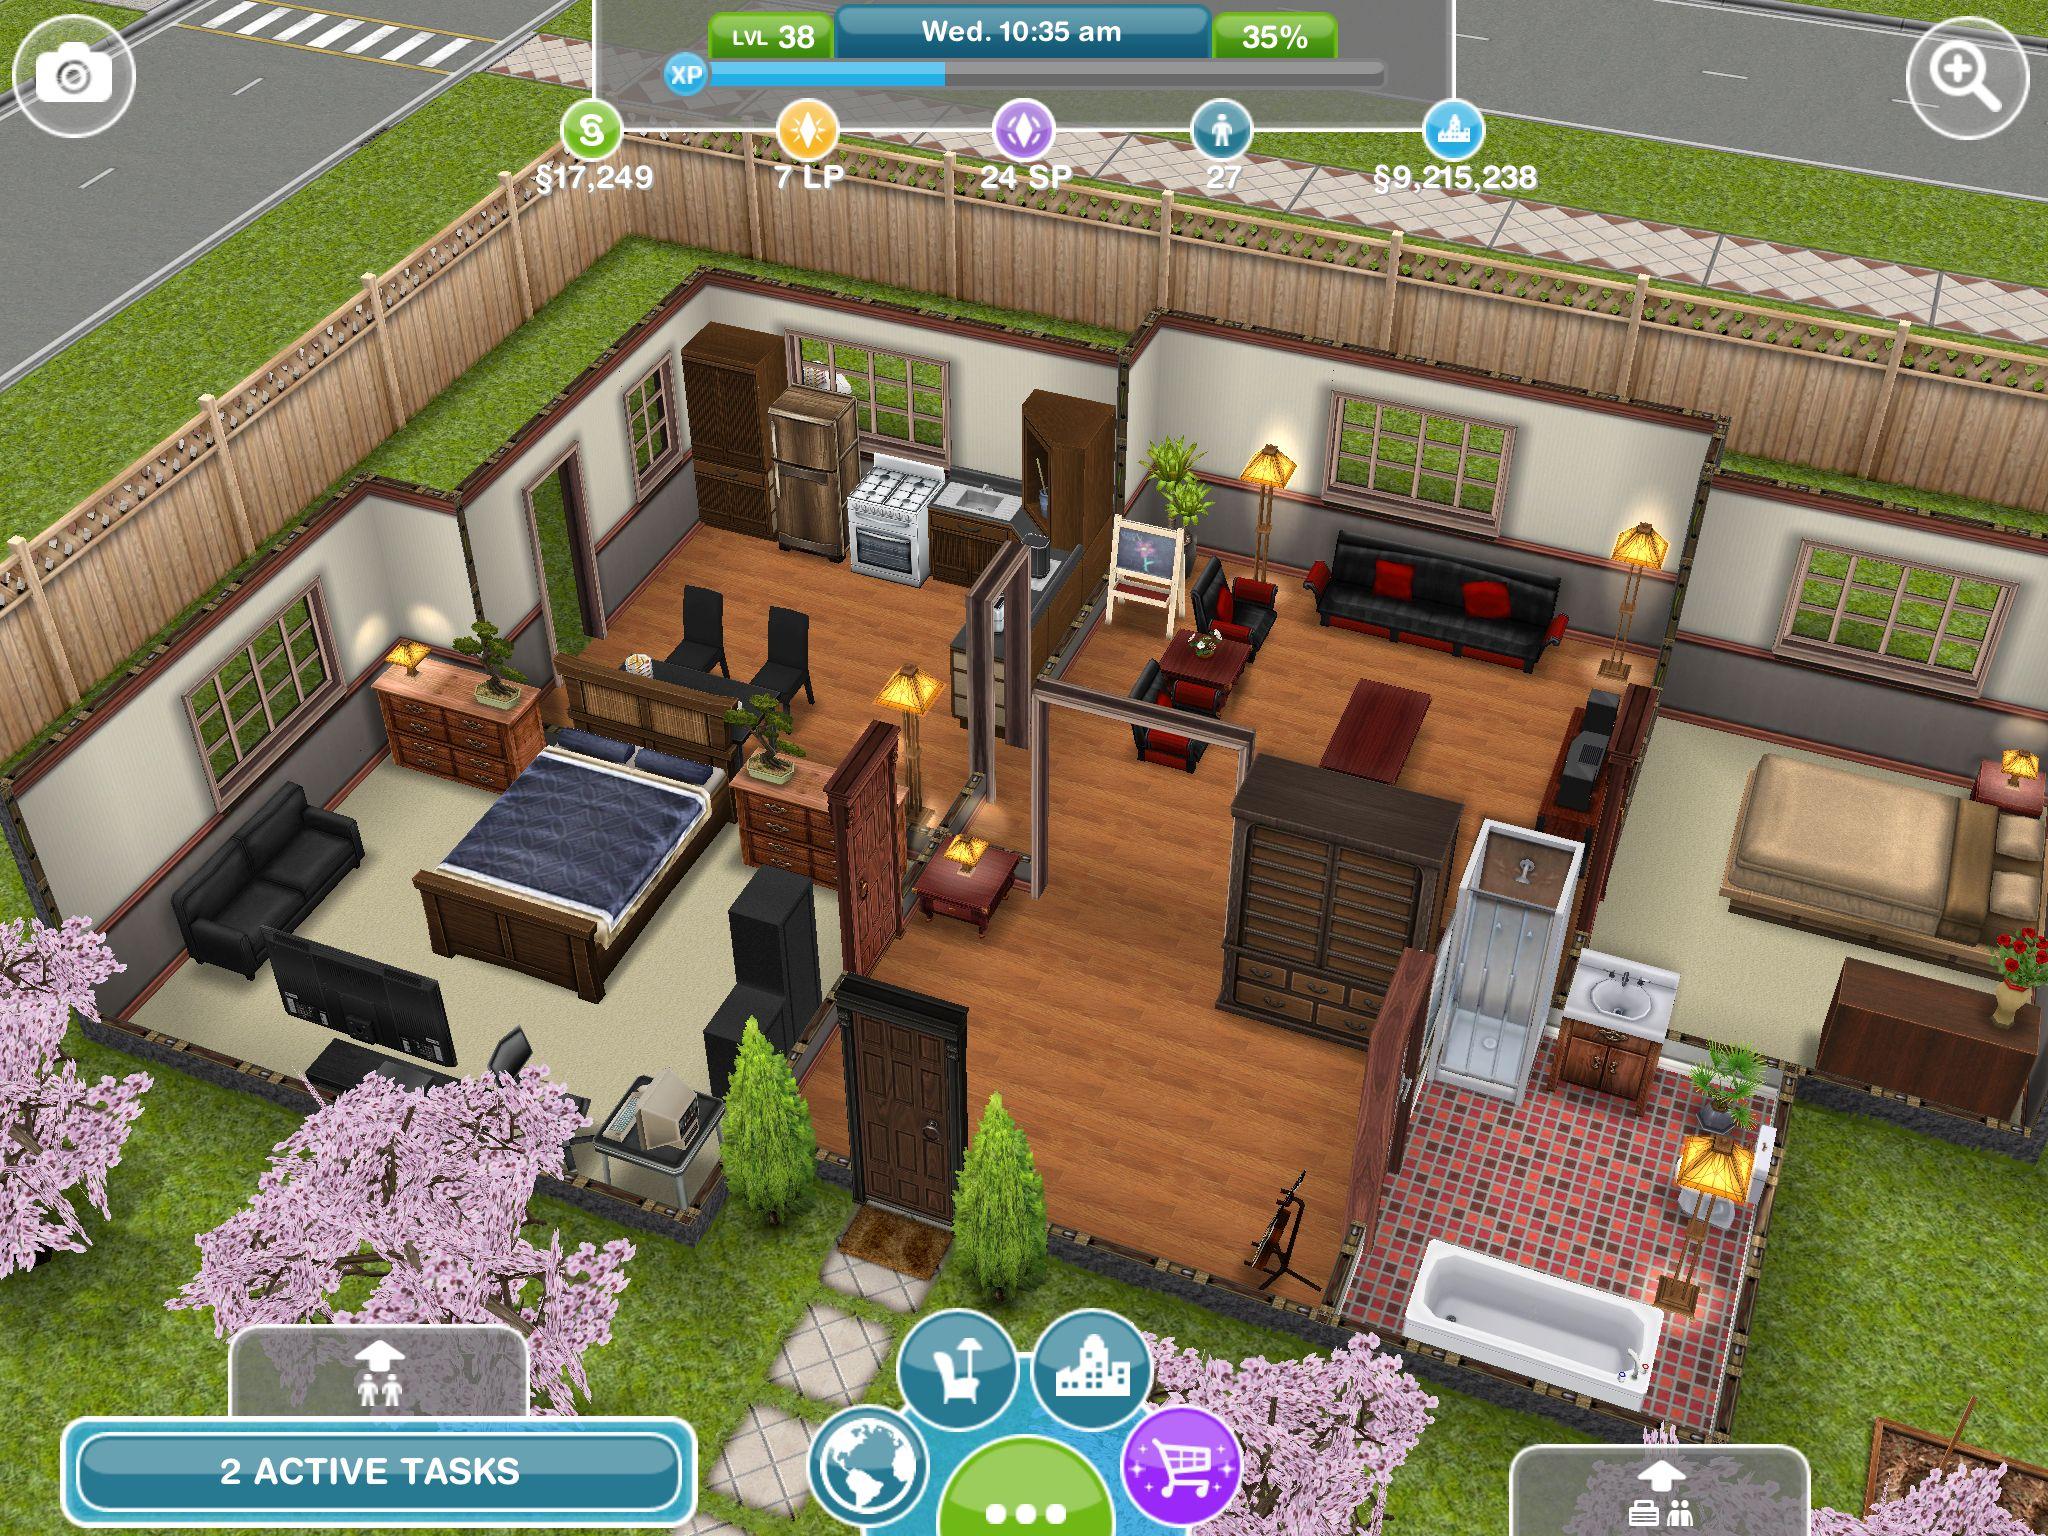 Sim Simple House Sims Simsfreeplay House Sims House Sims 4 House Building Sims Freeplay Houses